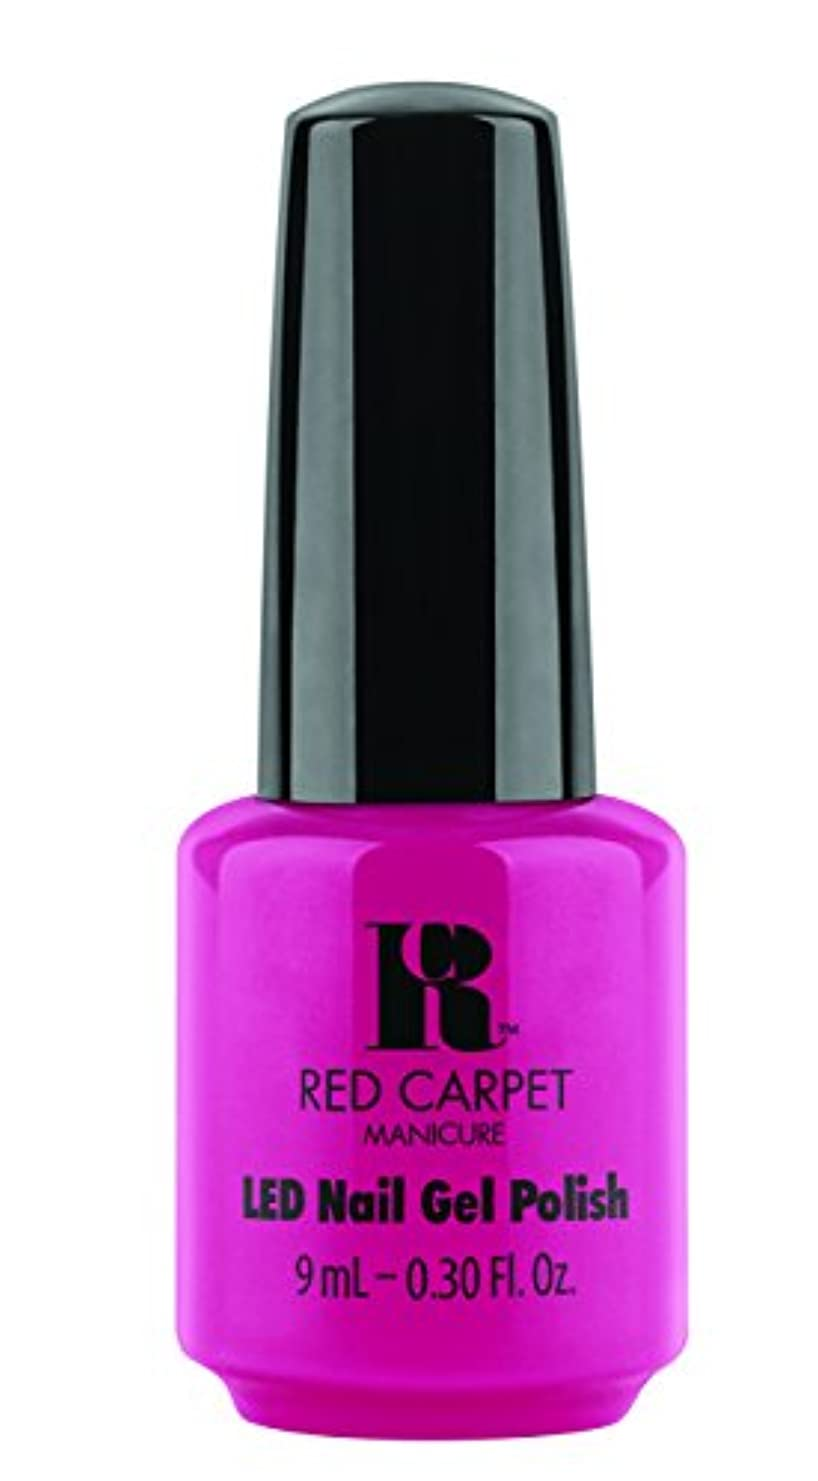 Red Carpet Manicure - LED Nail Gel Polish - Paparazzied - 0.3oz / 9ml